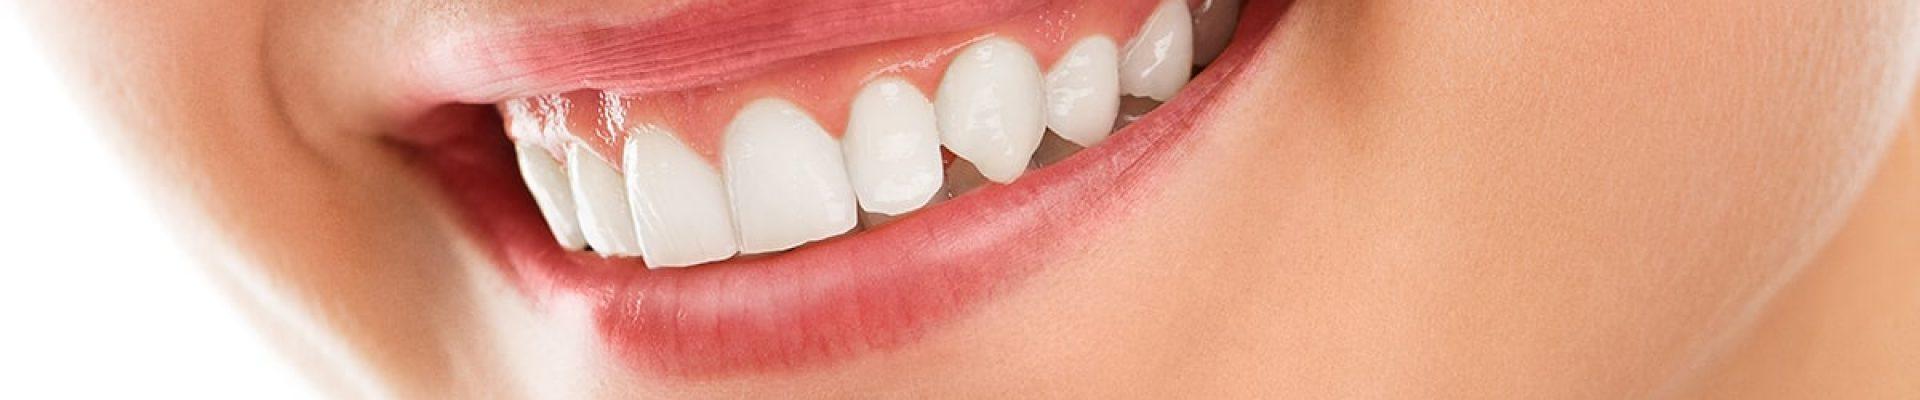 blanqueamiento dental san sebastian